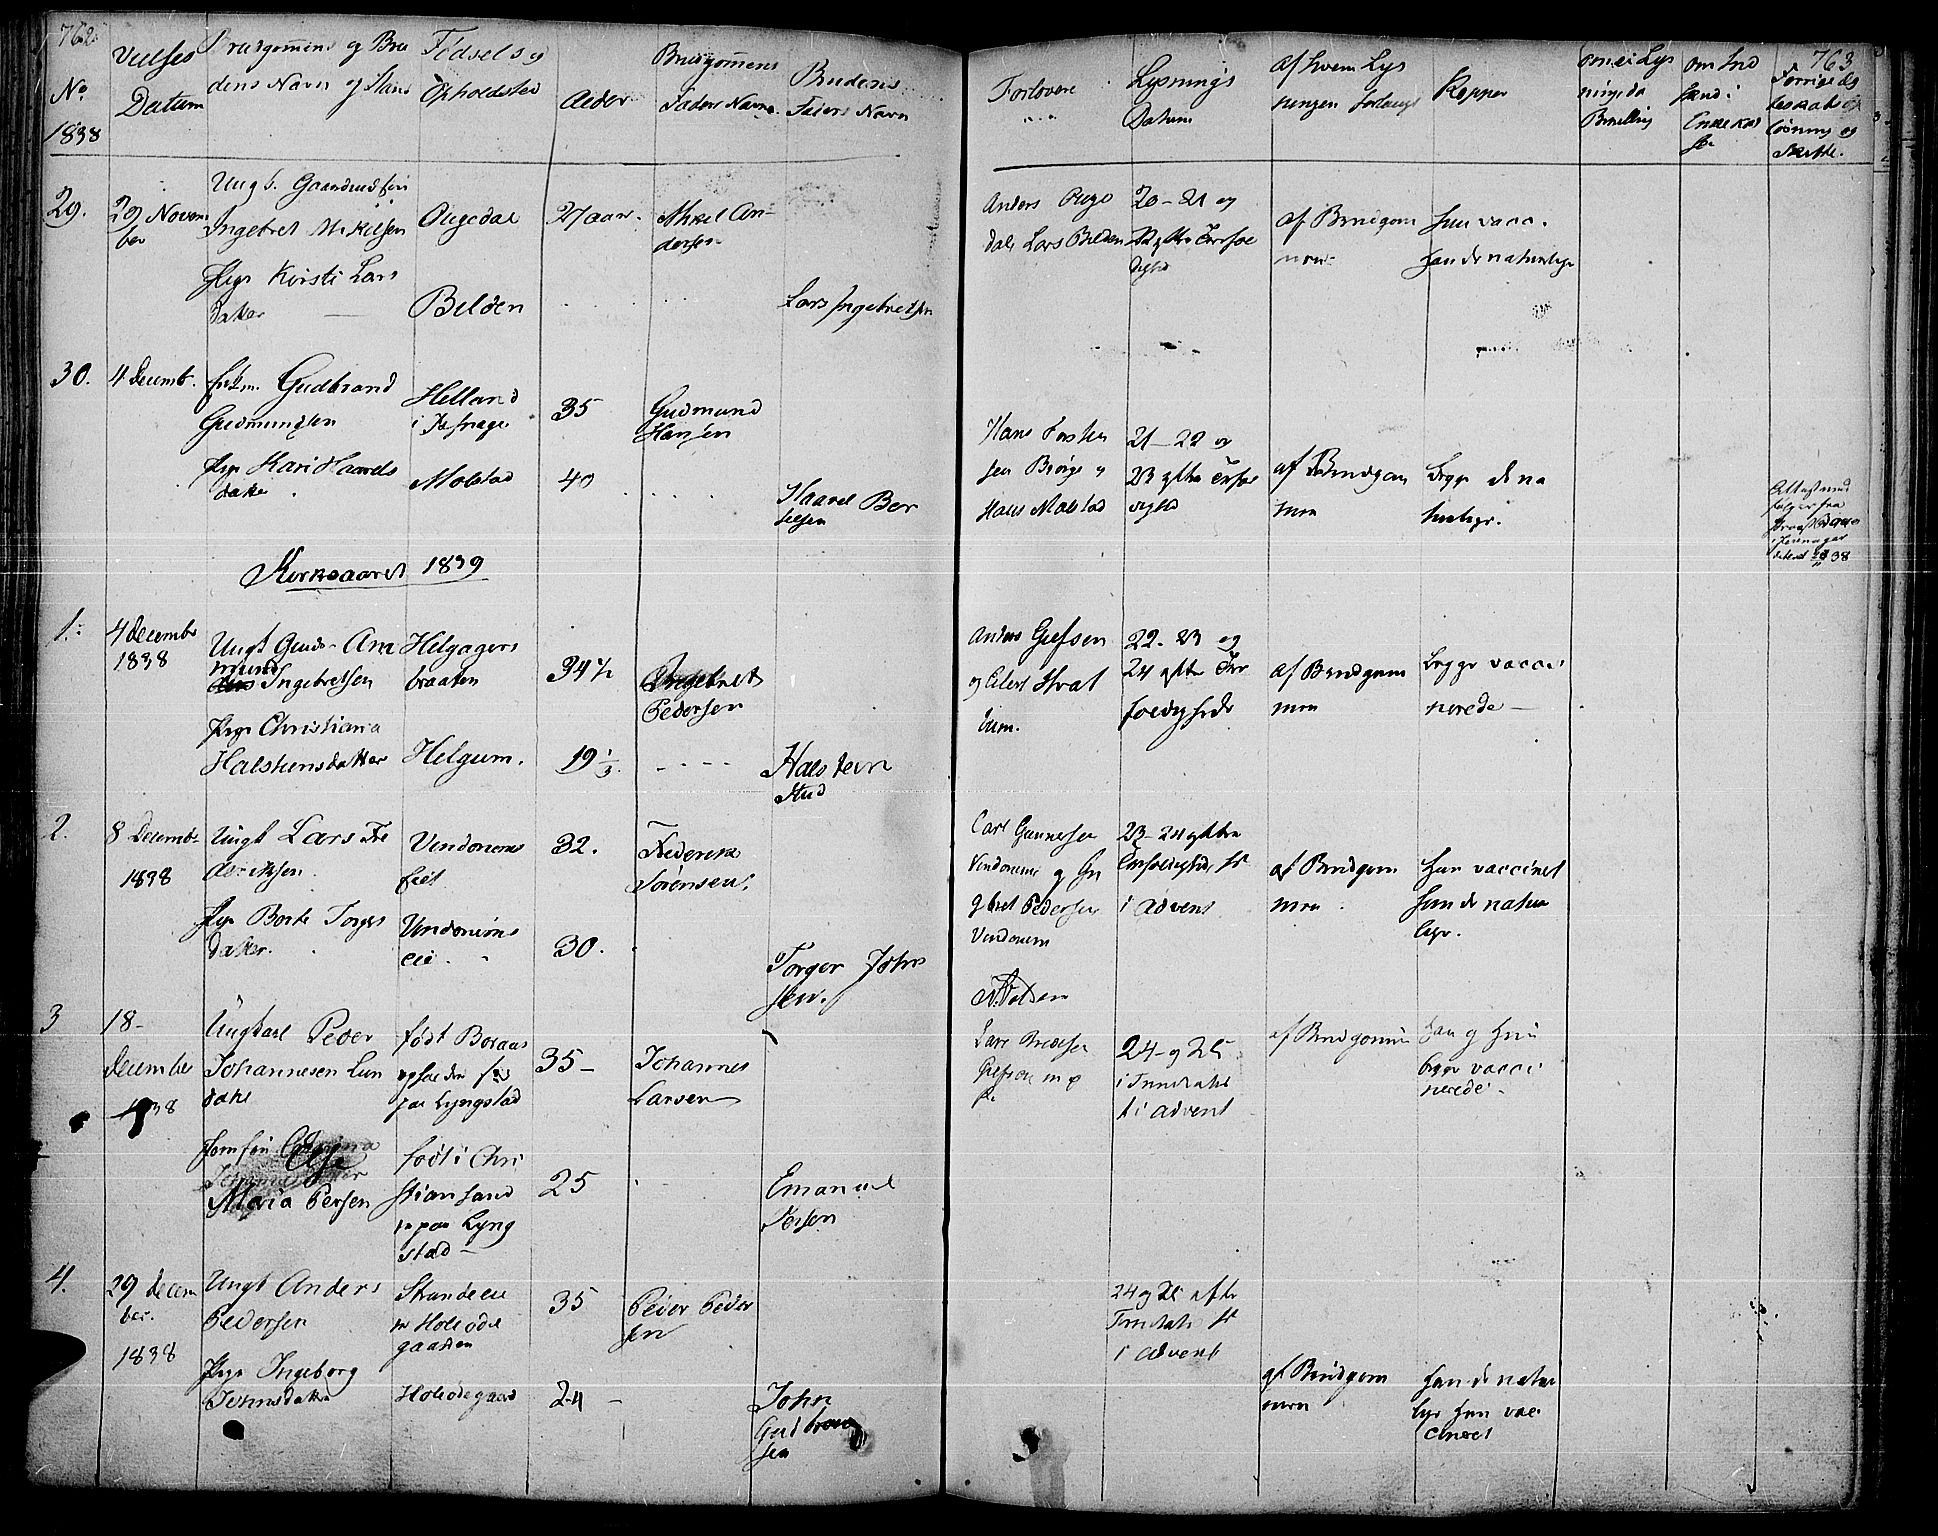 SAH, Gran prestekontor, Ministerialbok nr. 10, 1824-1842, s. 762-763